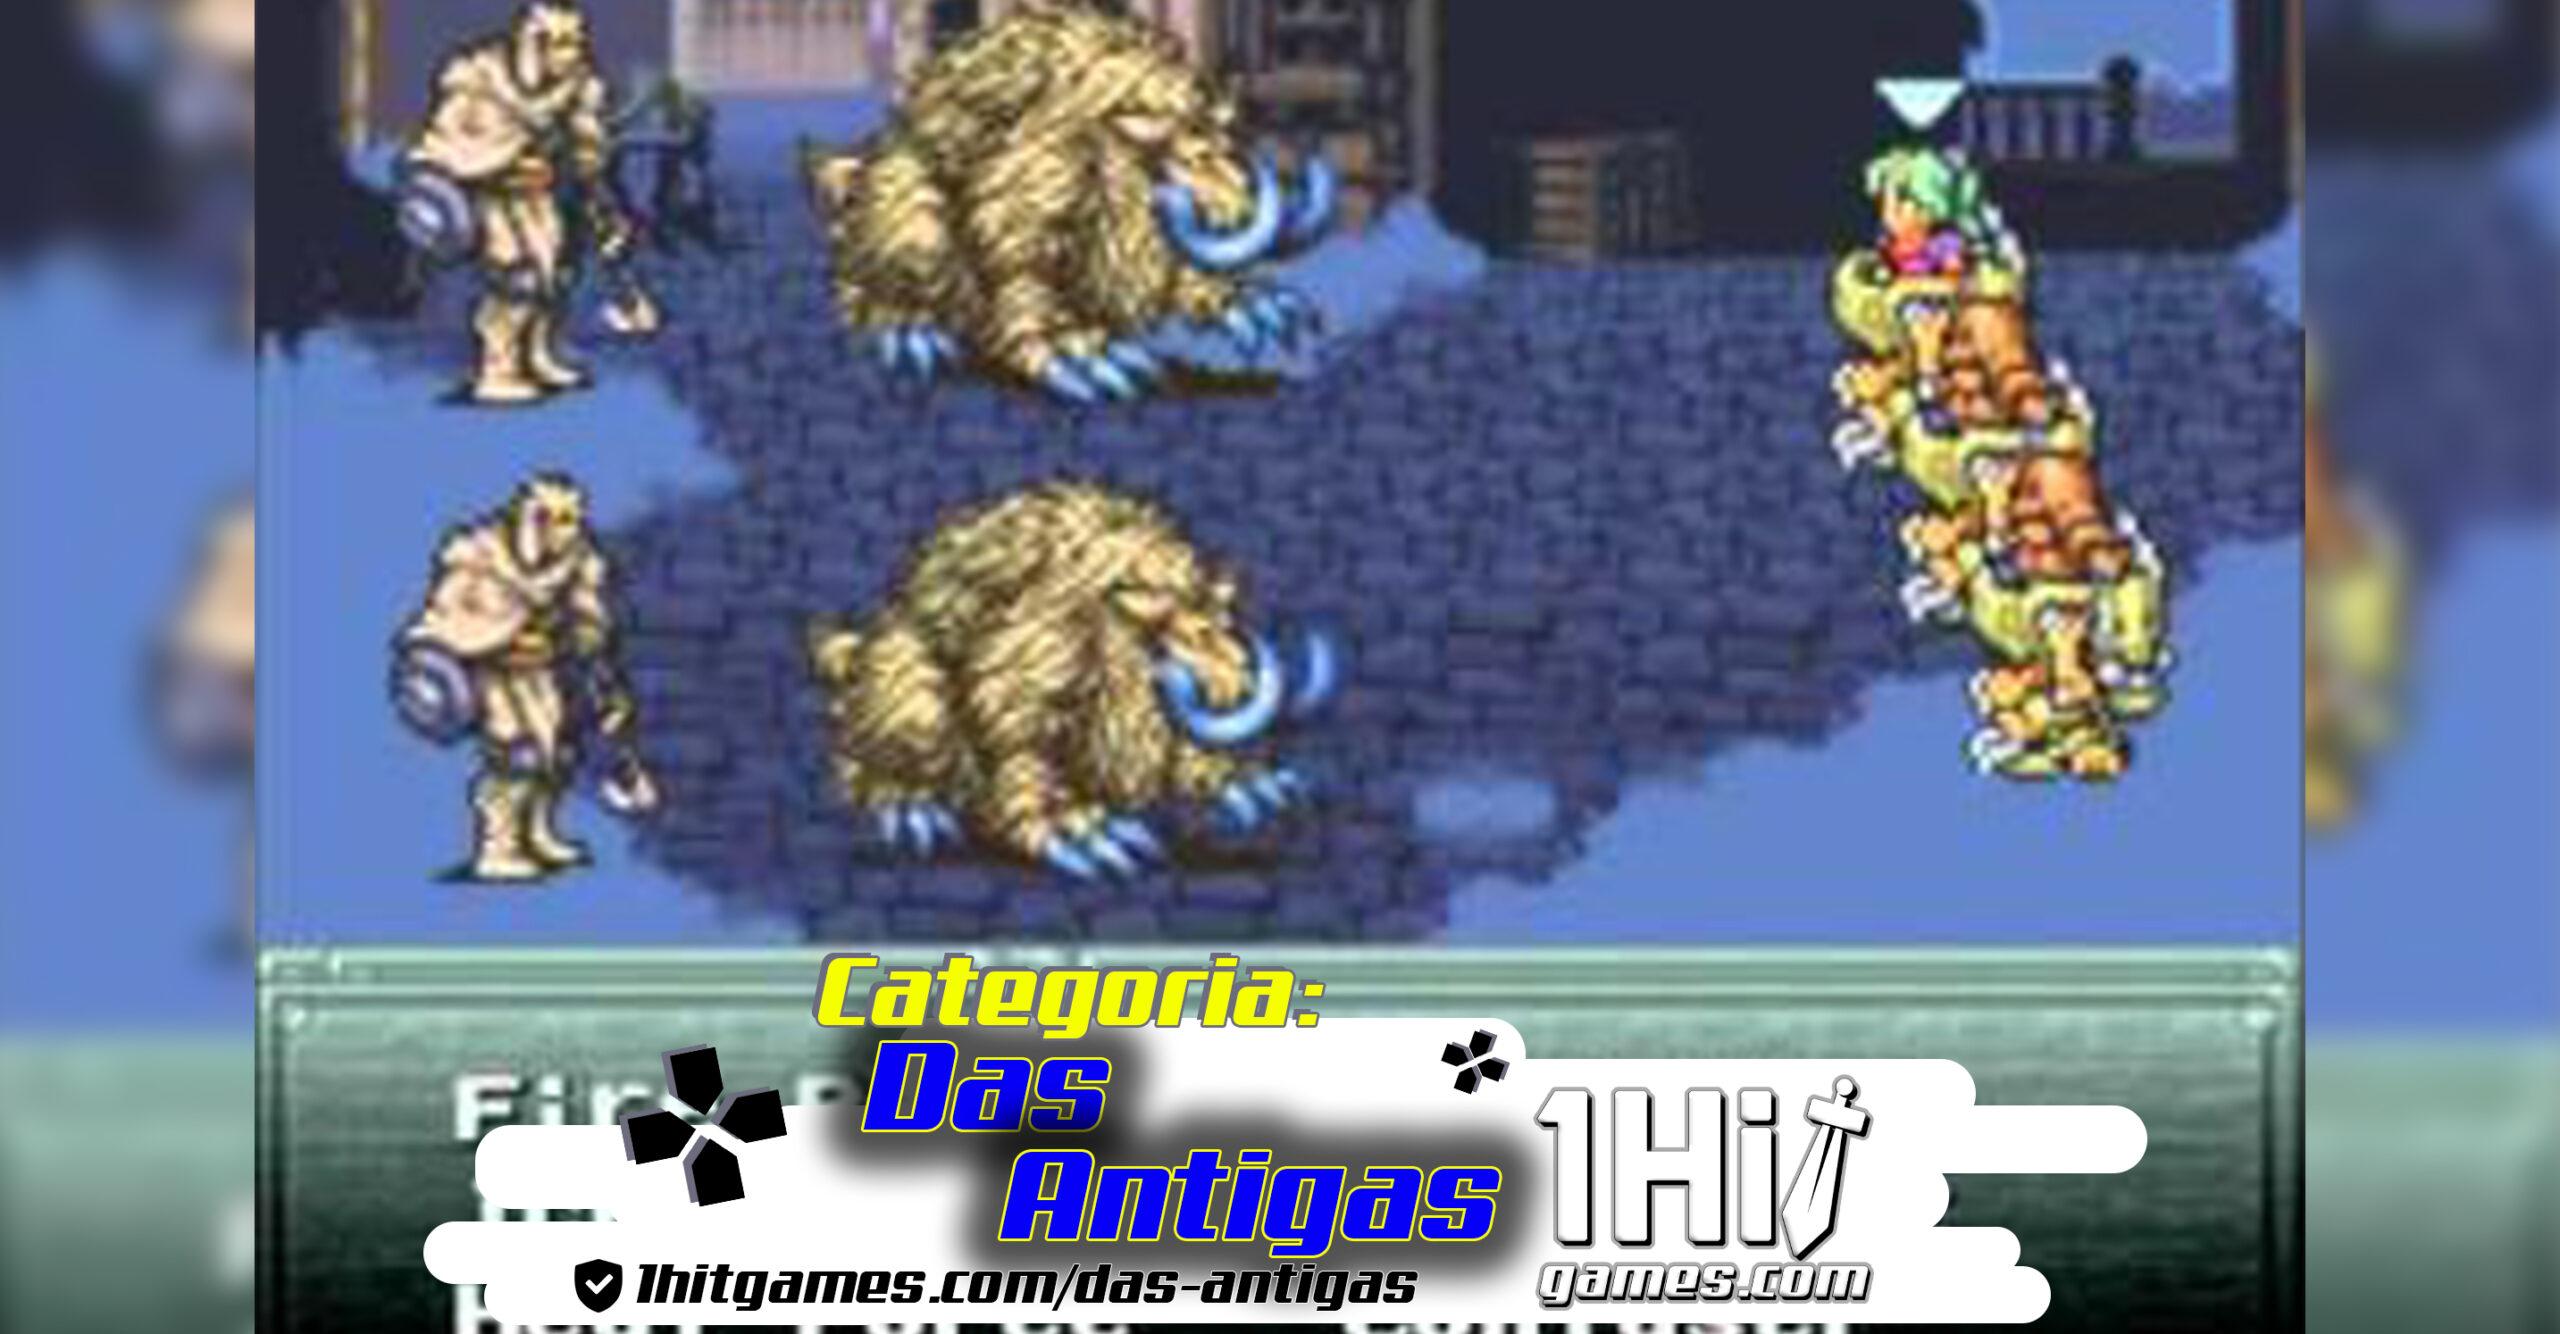 das antigas 1hitgames gaming gamer 1hit categorias nostalgia rpg